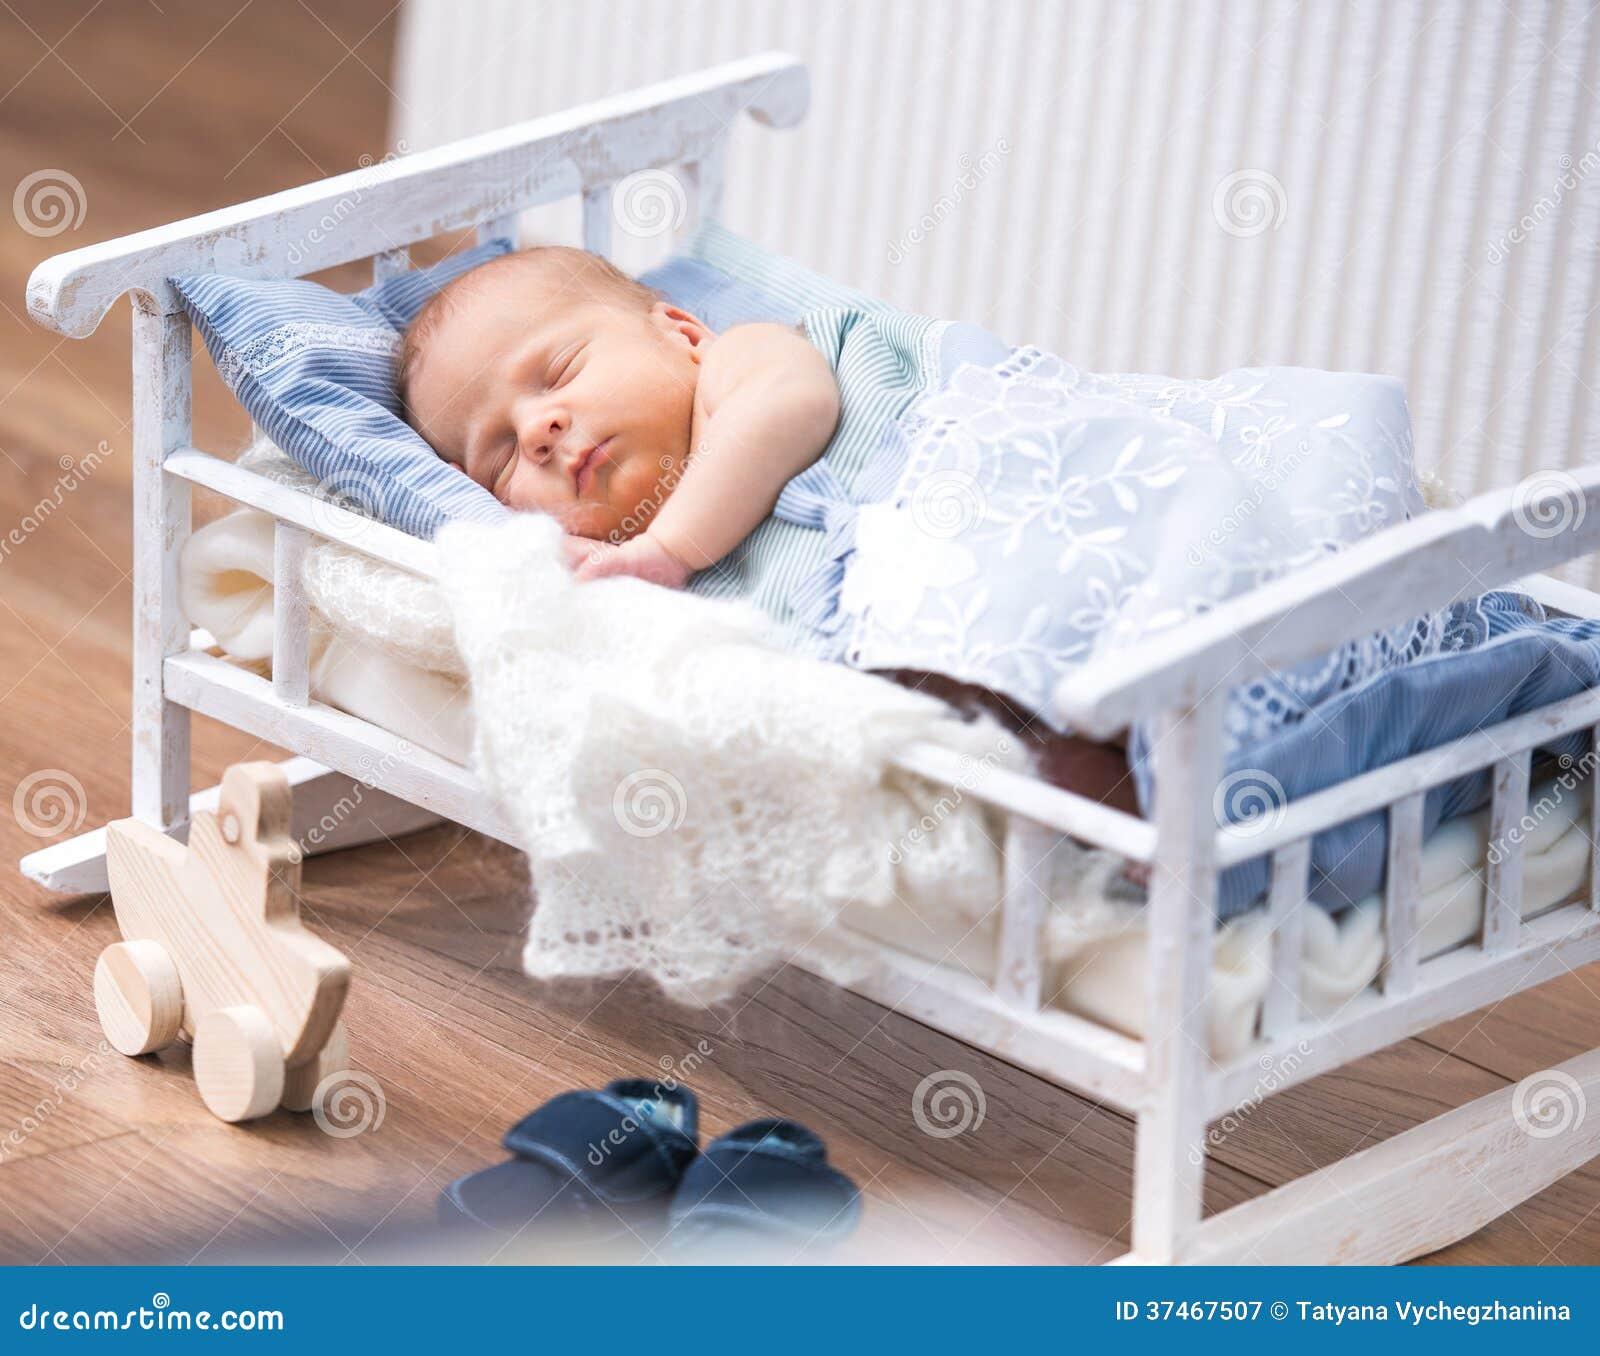 lit bebe nouveau ne